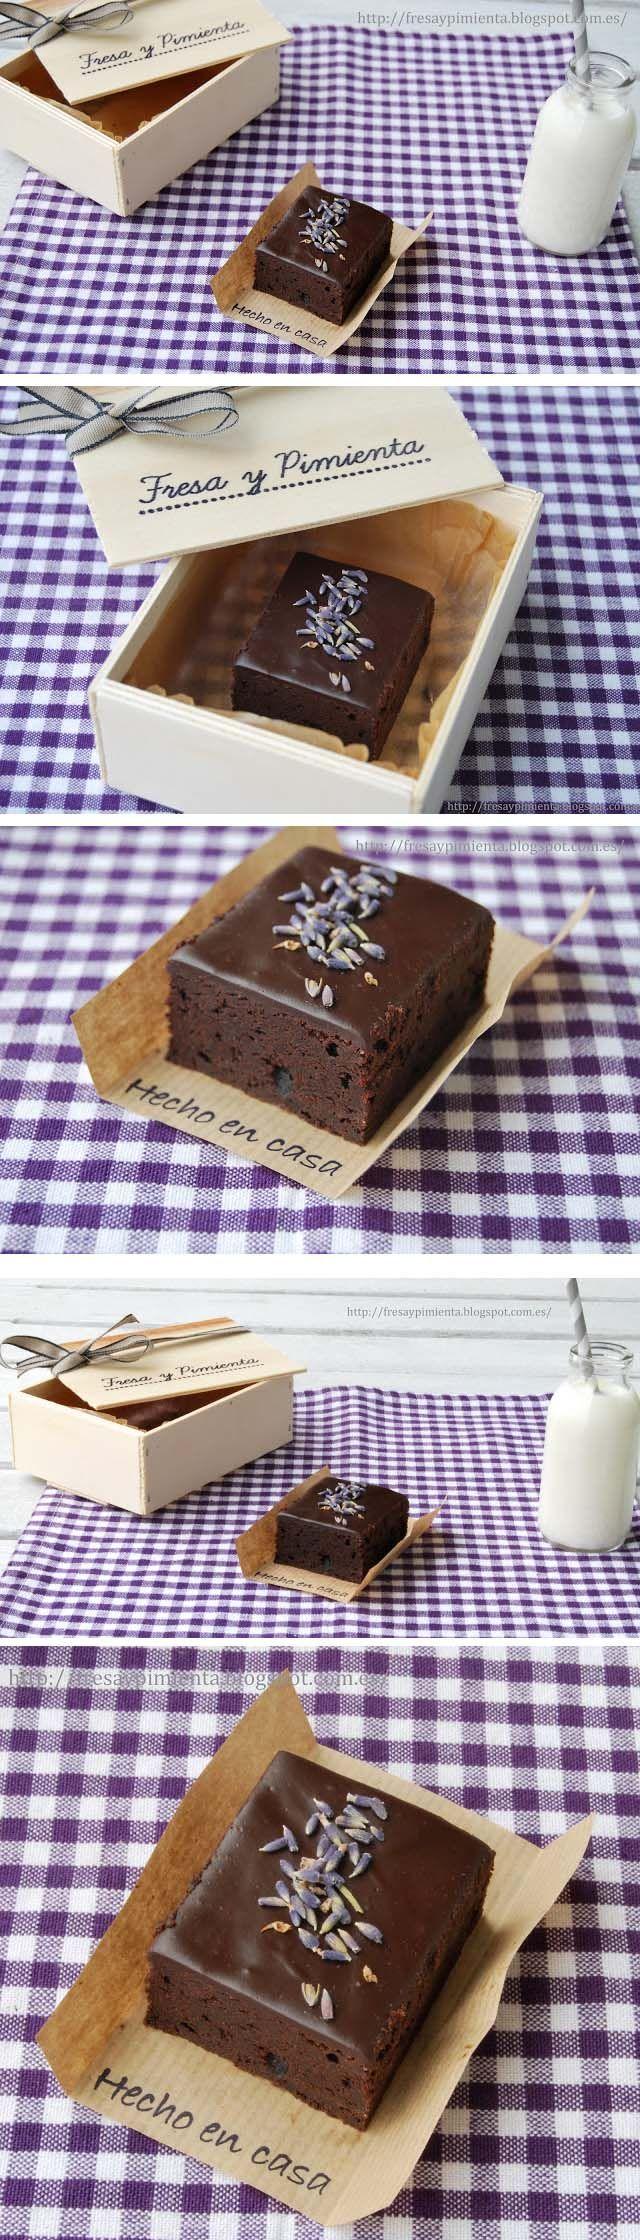 Brownie de chocolate y lavanda